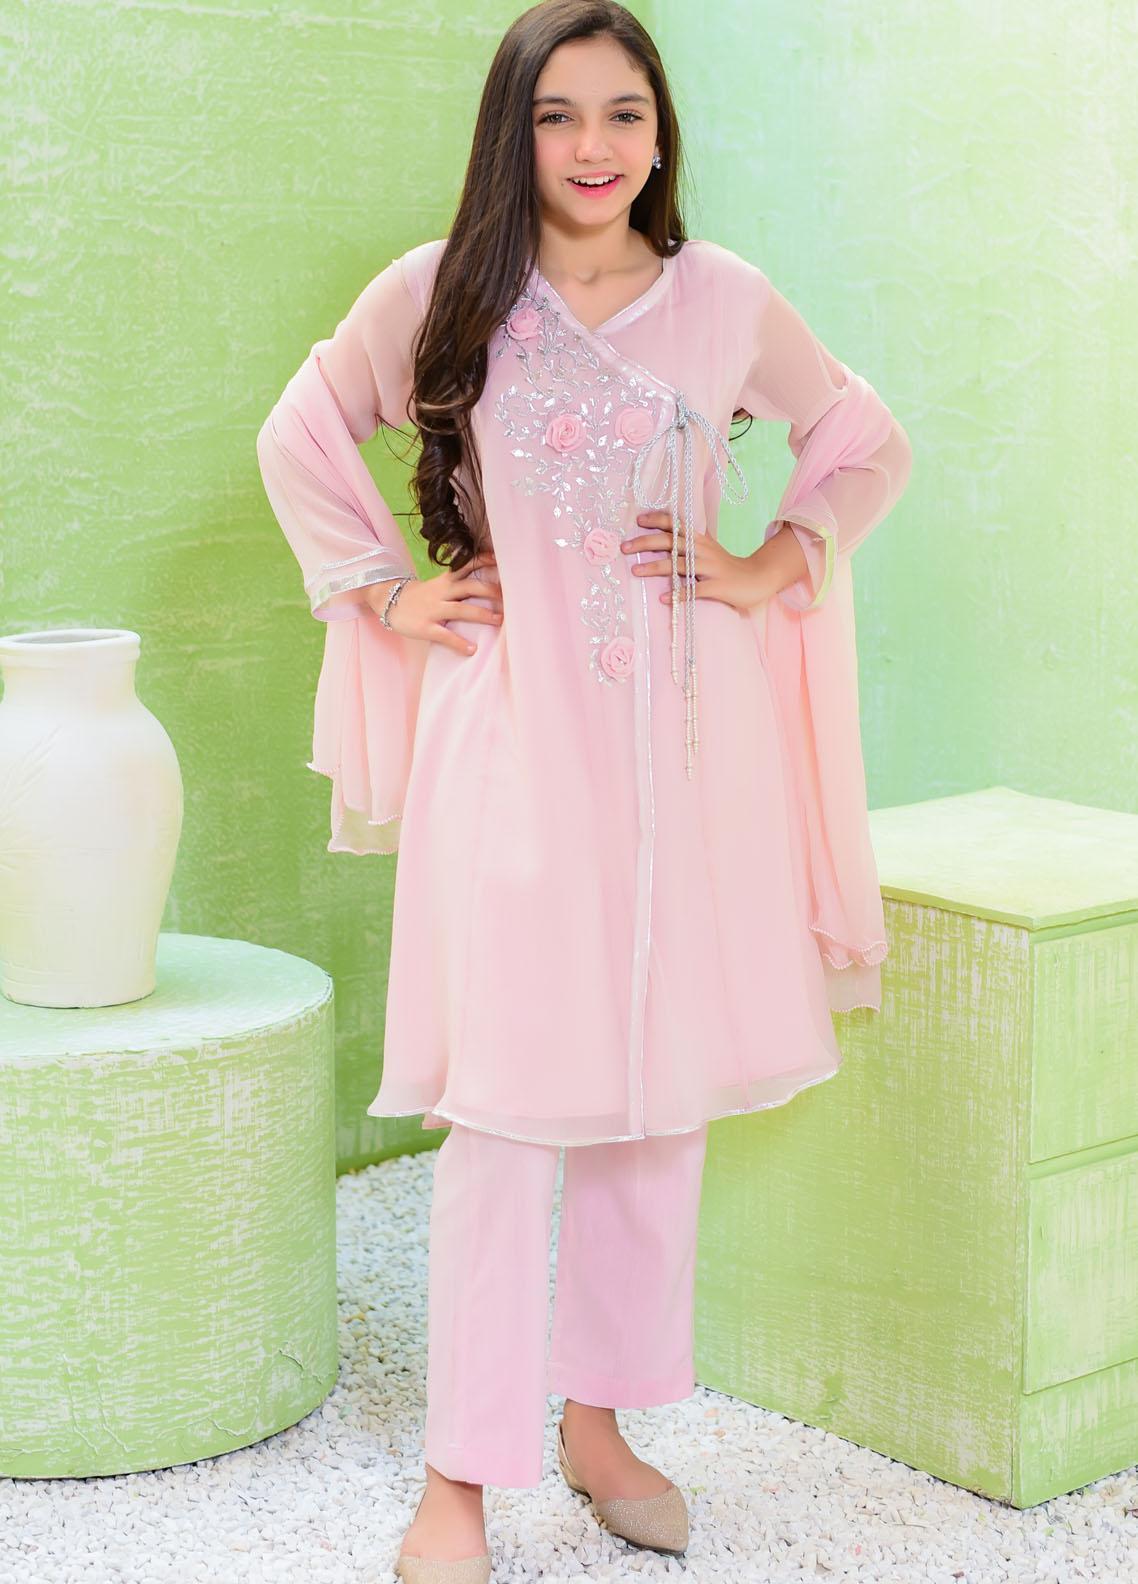 Ochre Chiffon Fancy Girls 3 Piece -  OFW-323 Poweder Pink